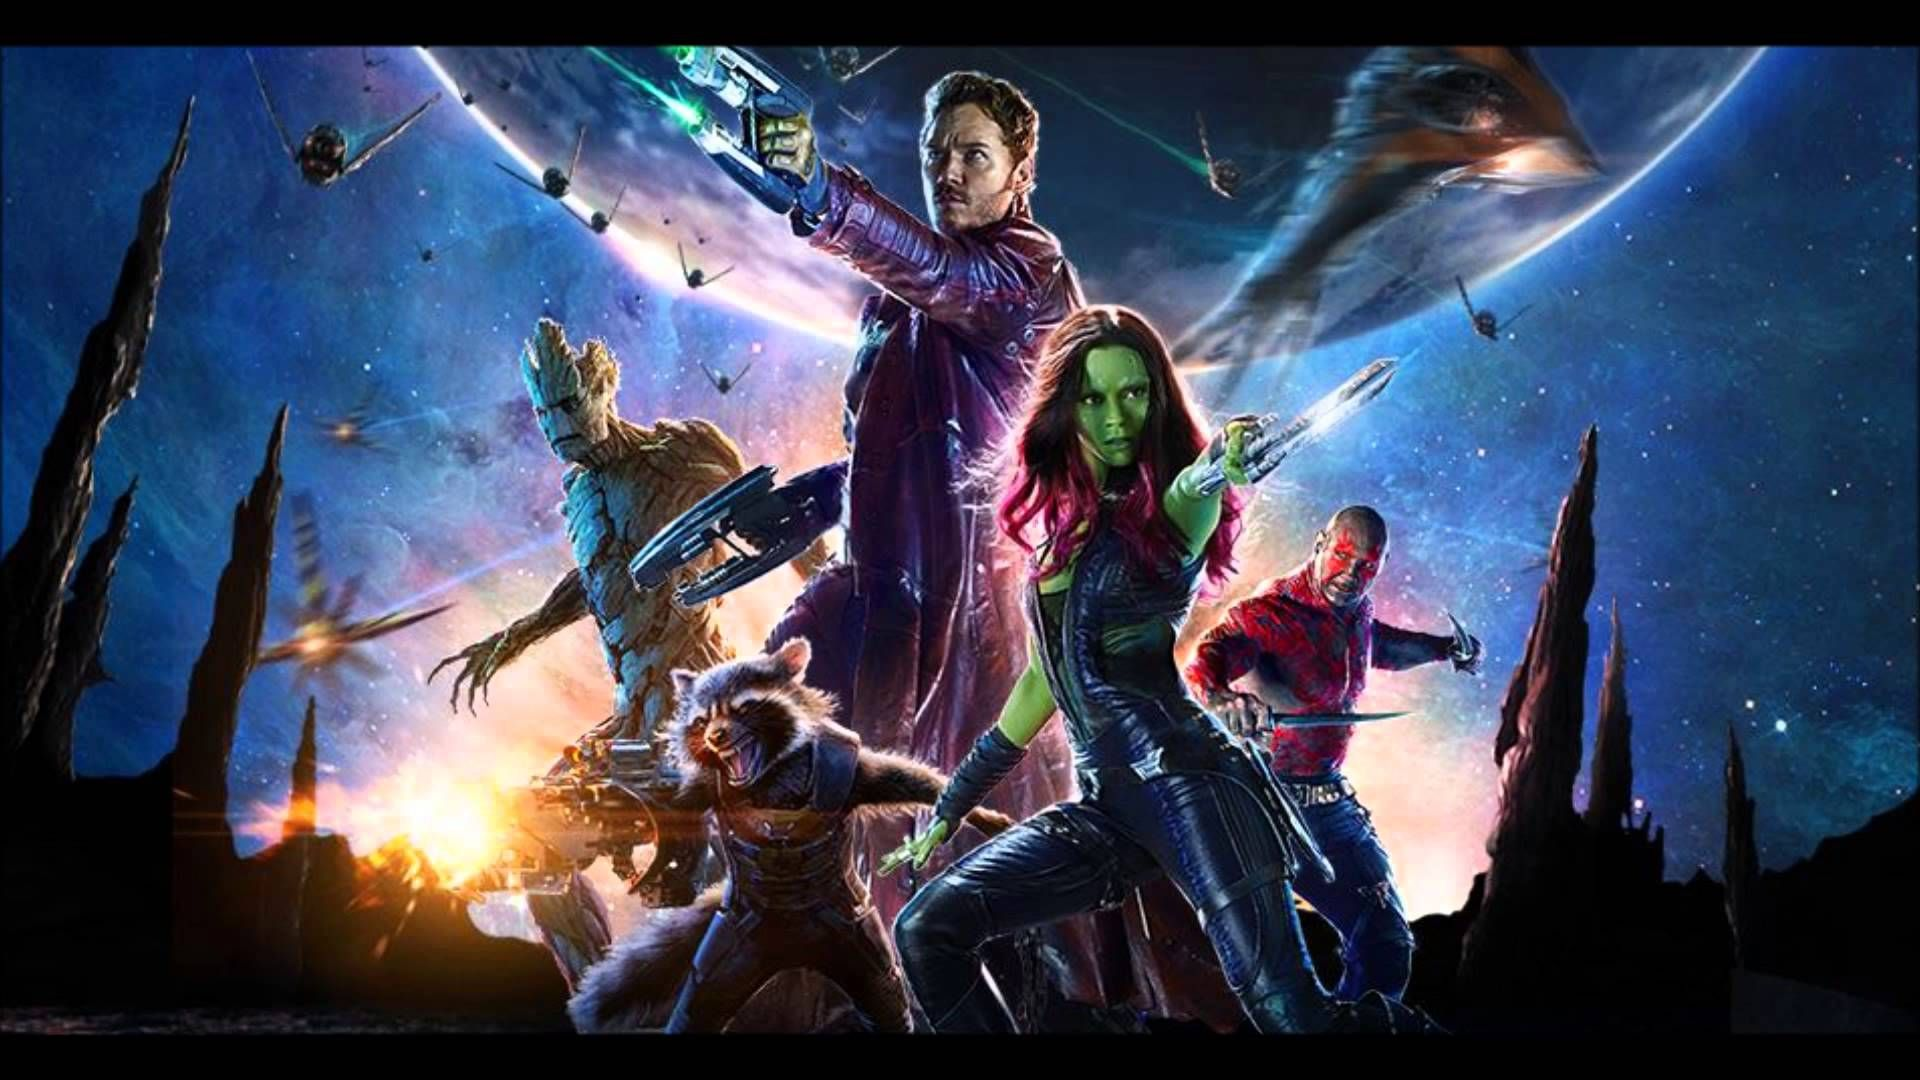 Guardiansofthegalaxy Best Superhero Film Of 2014 Marvel Galaxy Movie Guardians Of The Galaxy Galaxy Poster